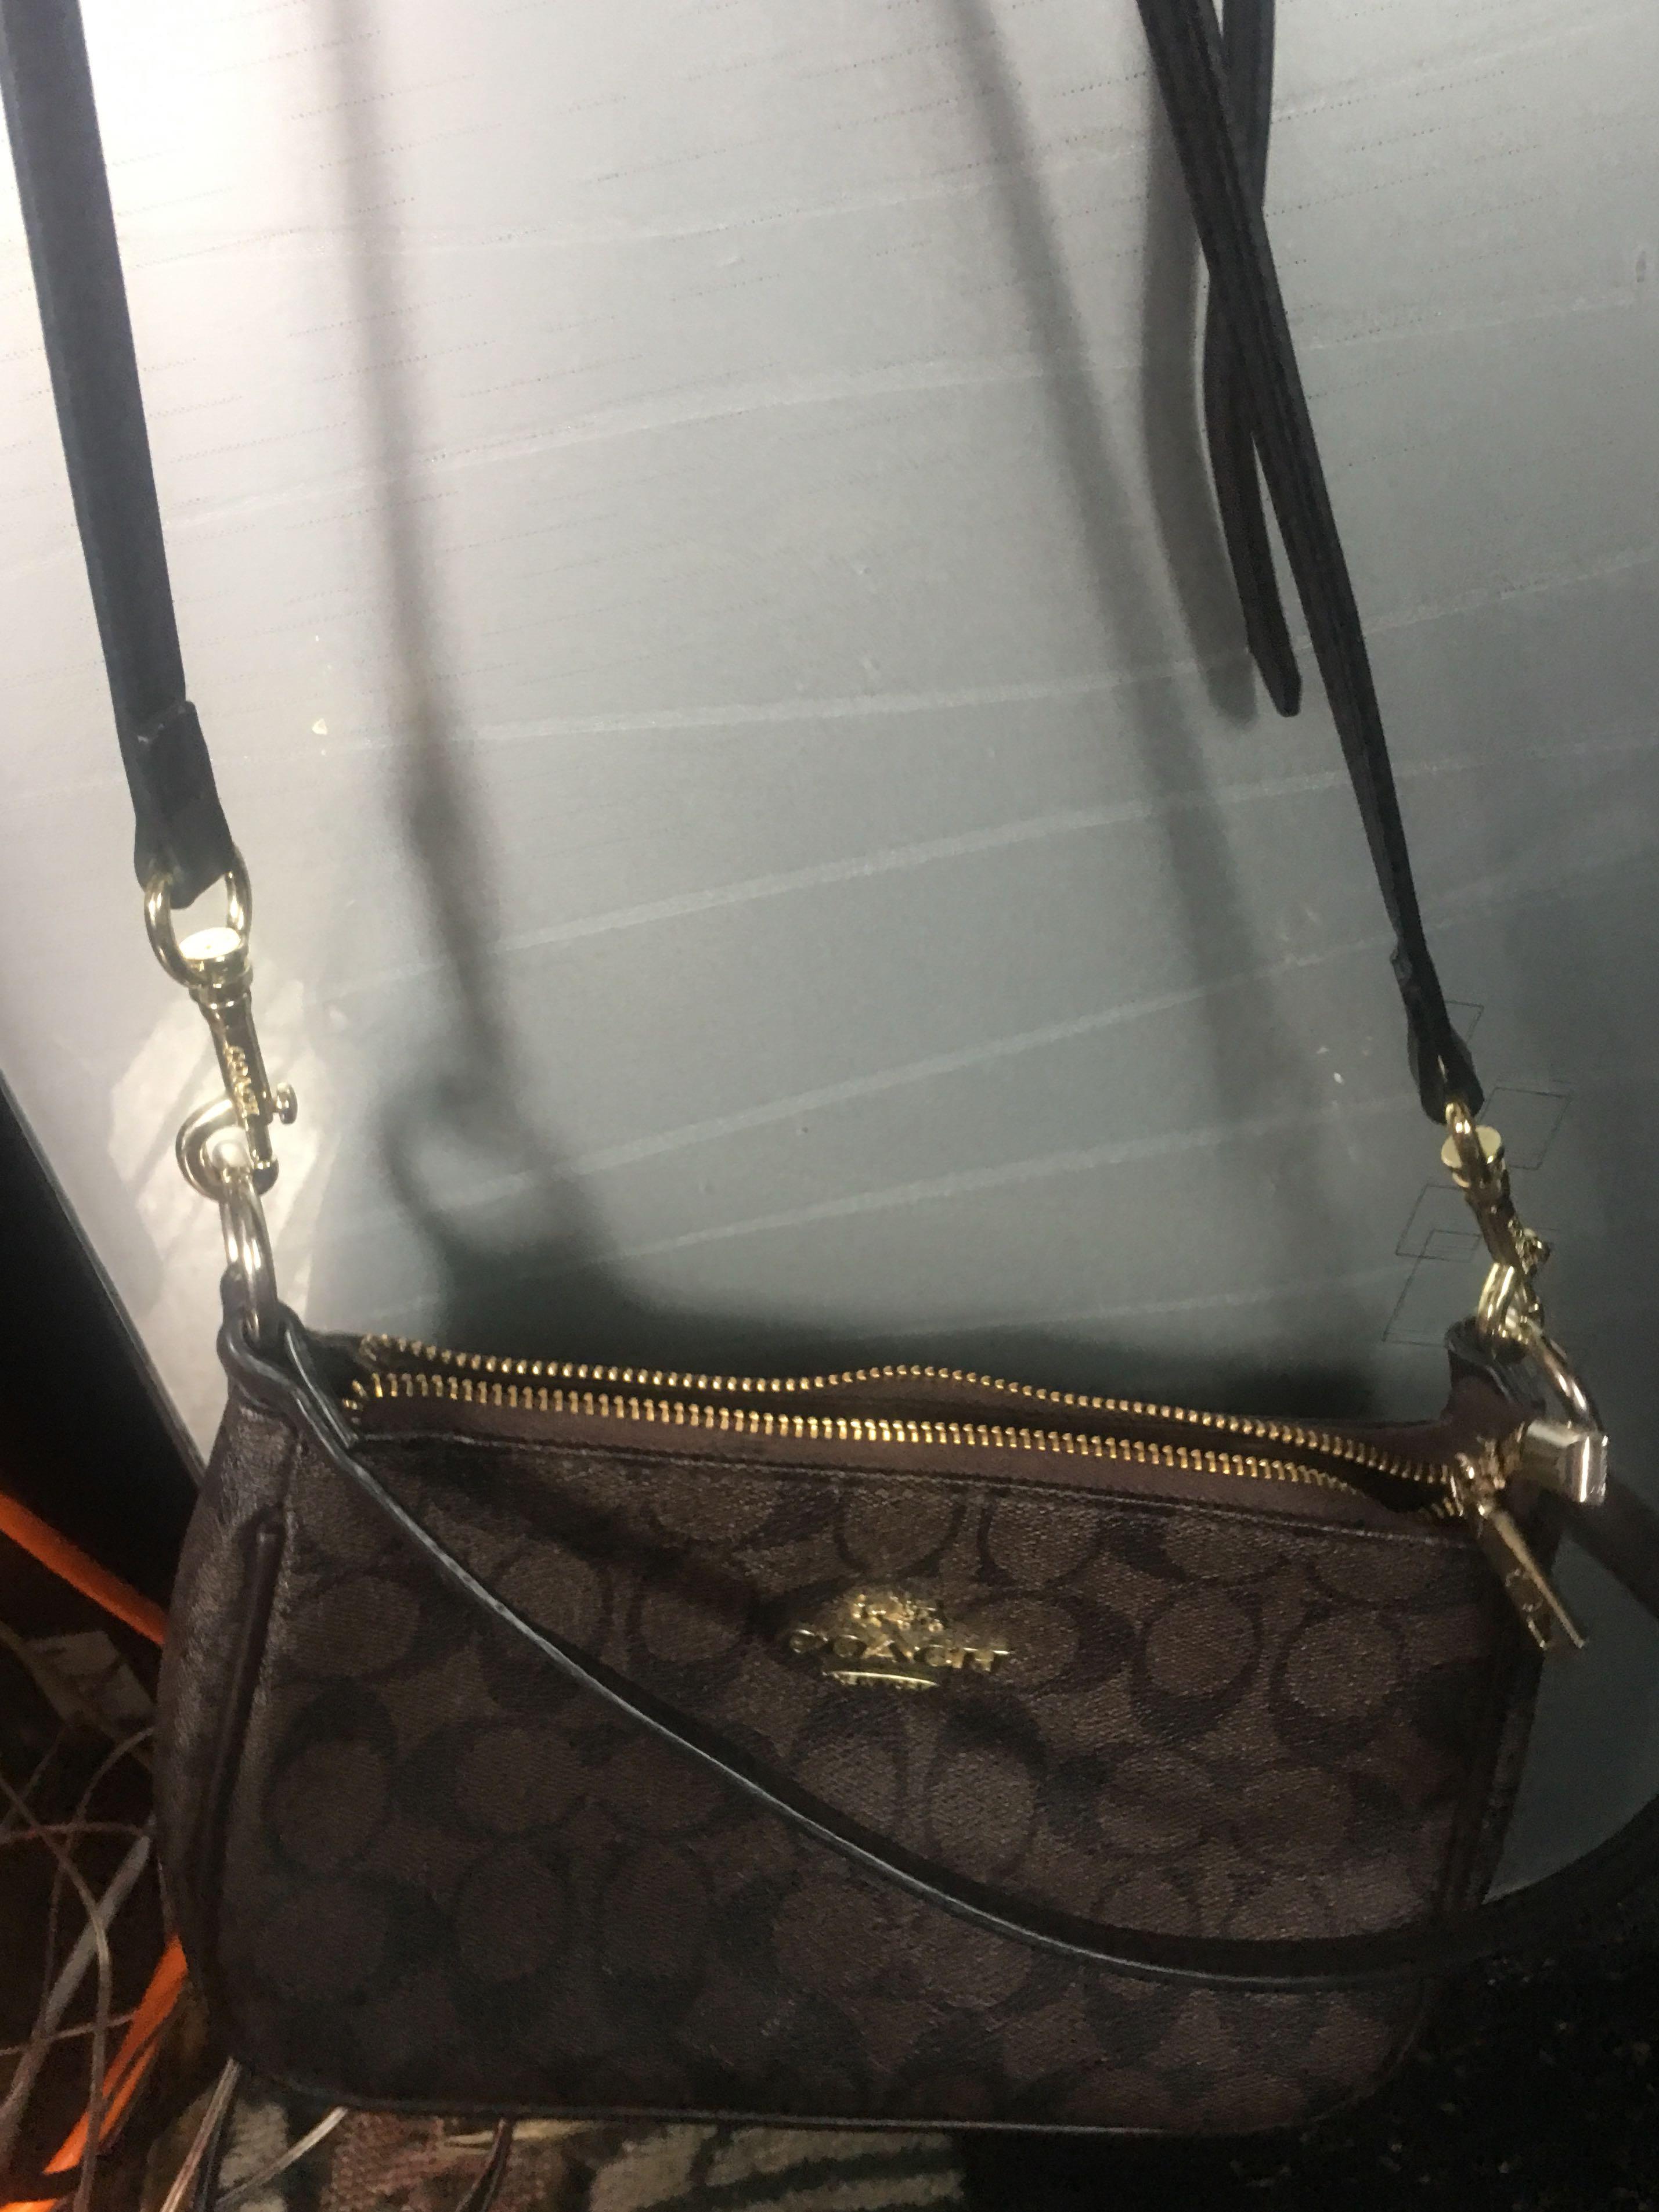 745236cbdd5 Coach Handbag Replacement Straps